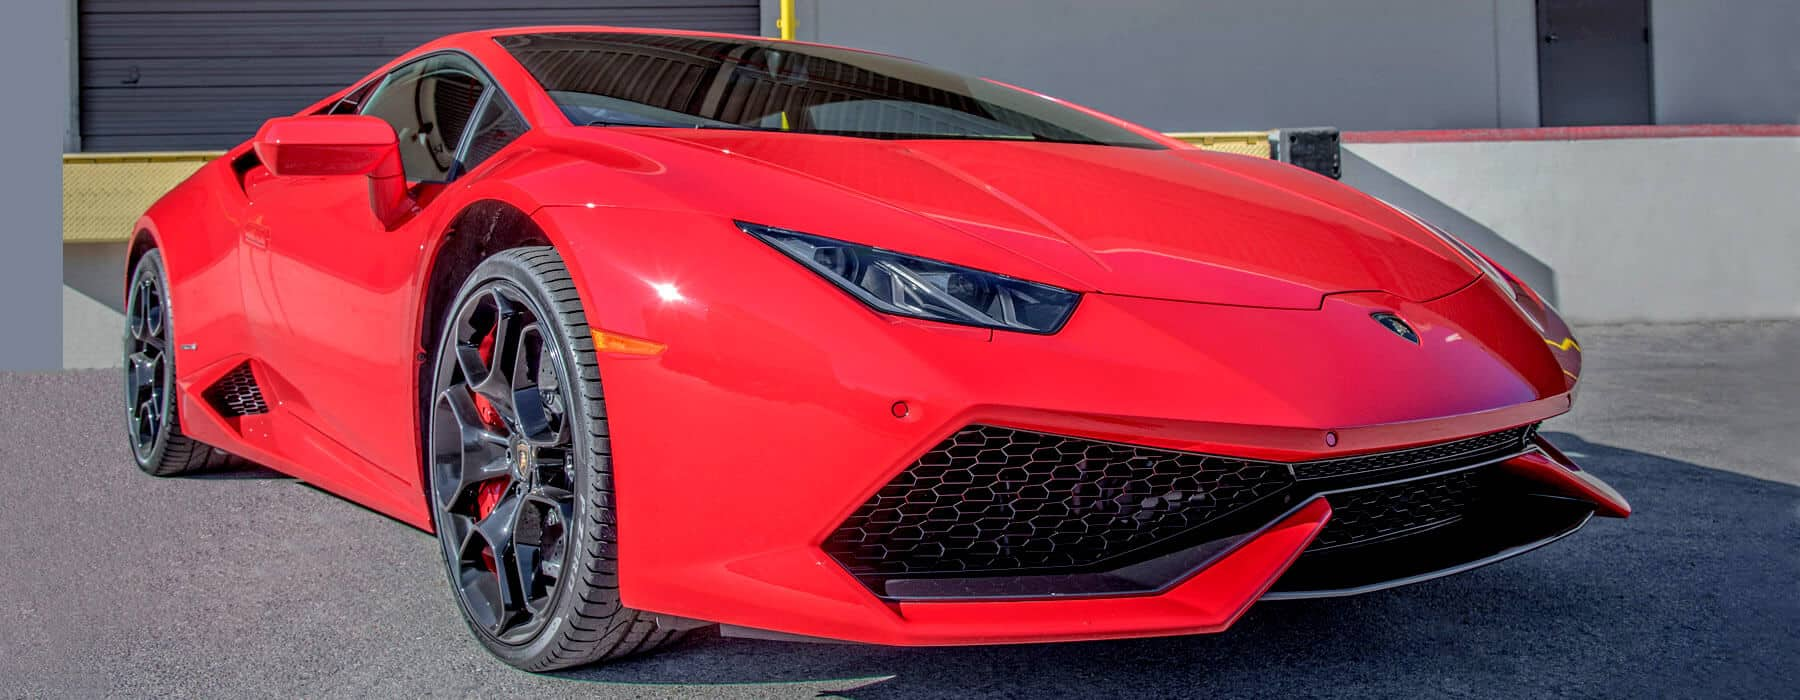 Enterprise Car Sales Las Vegas